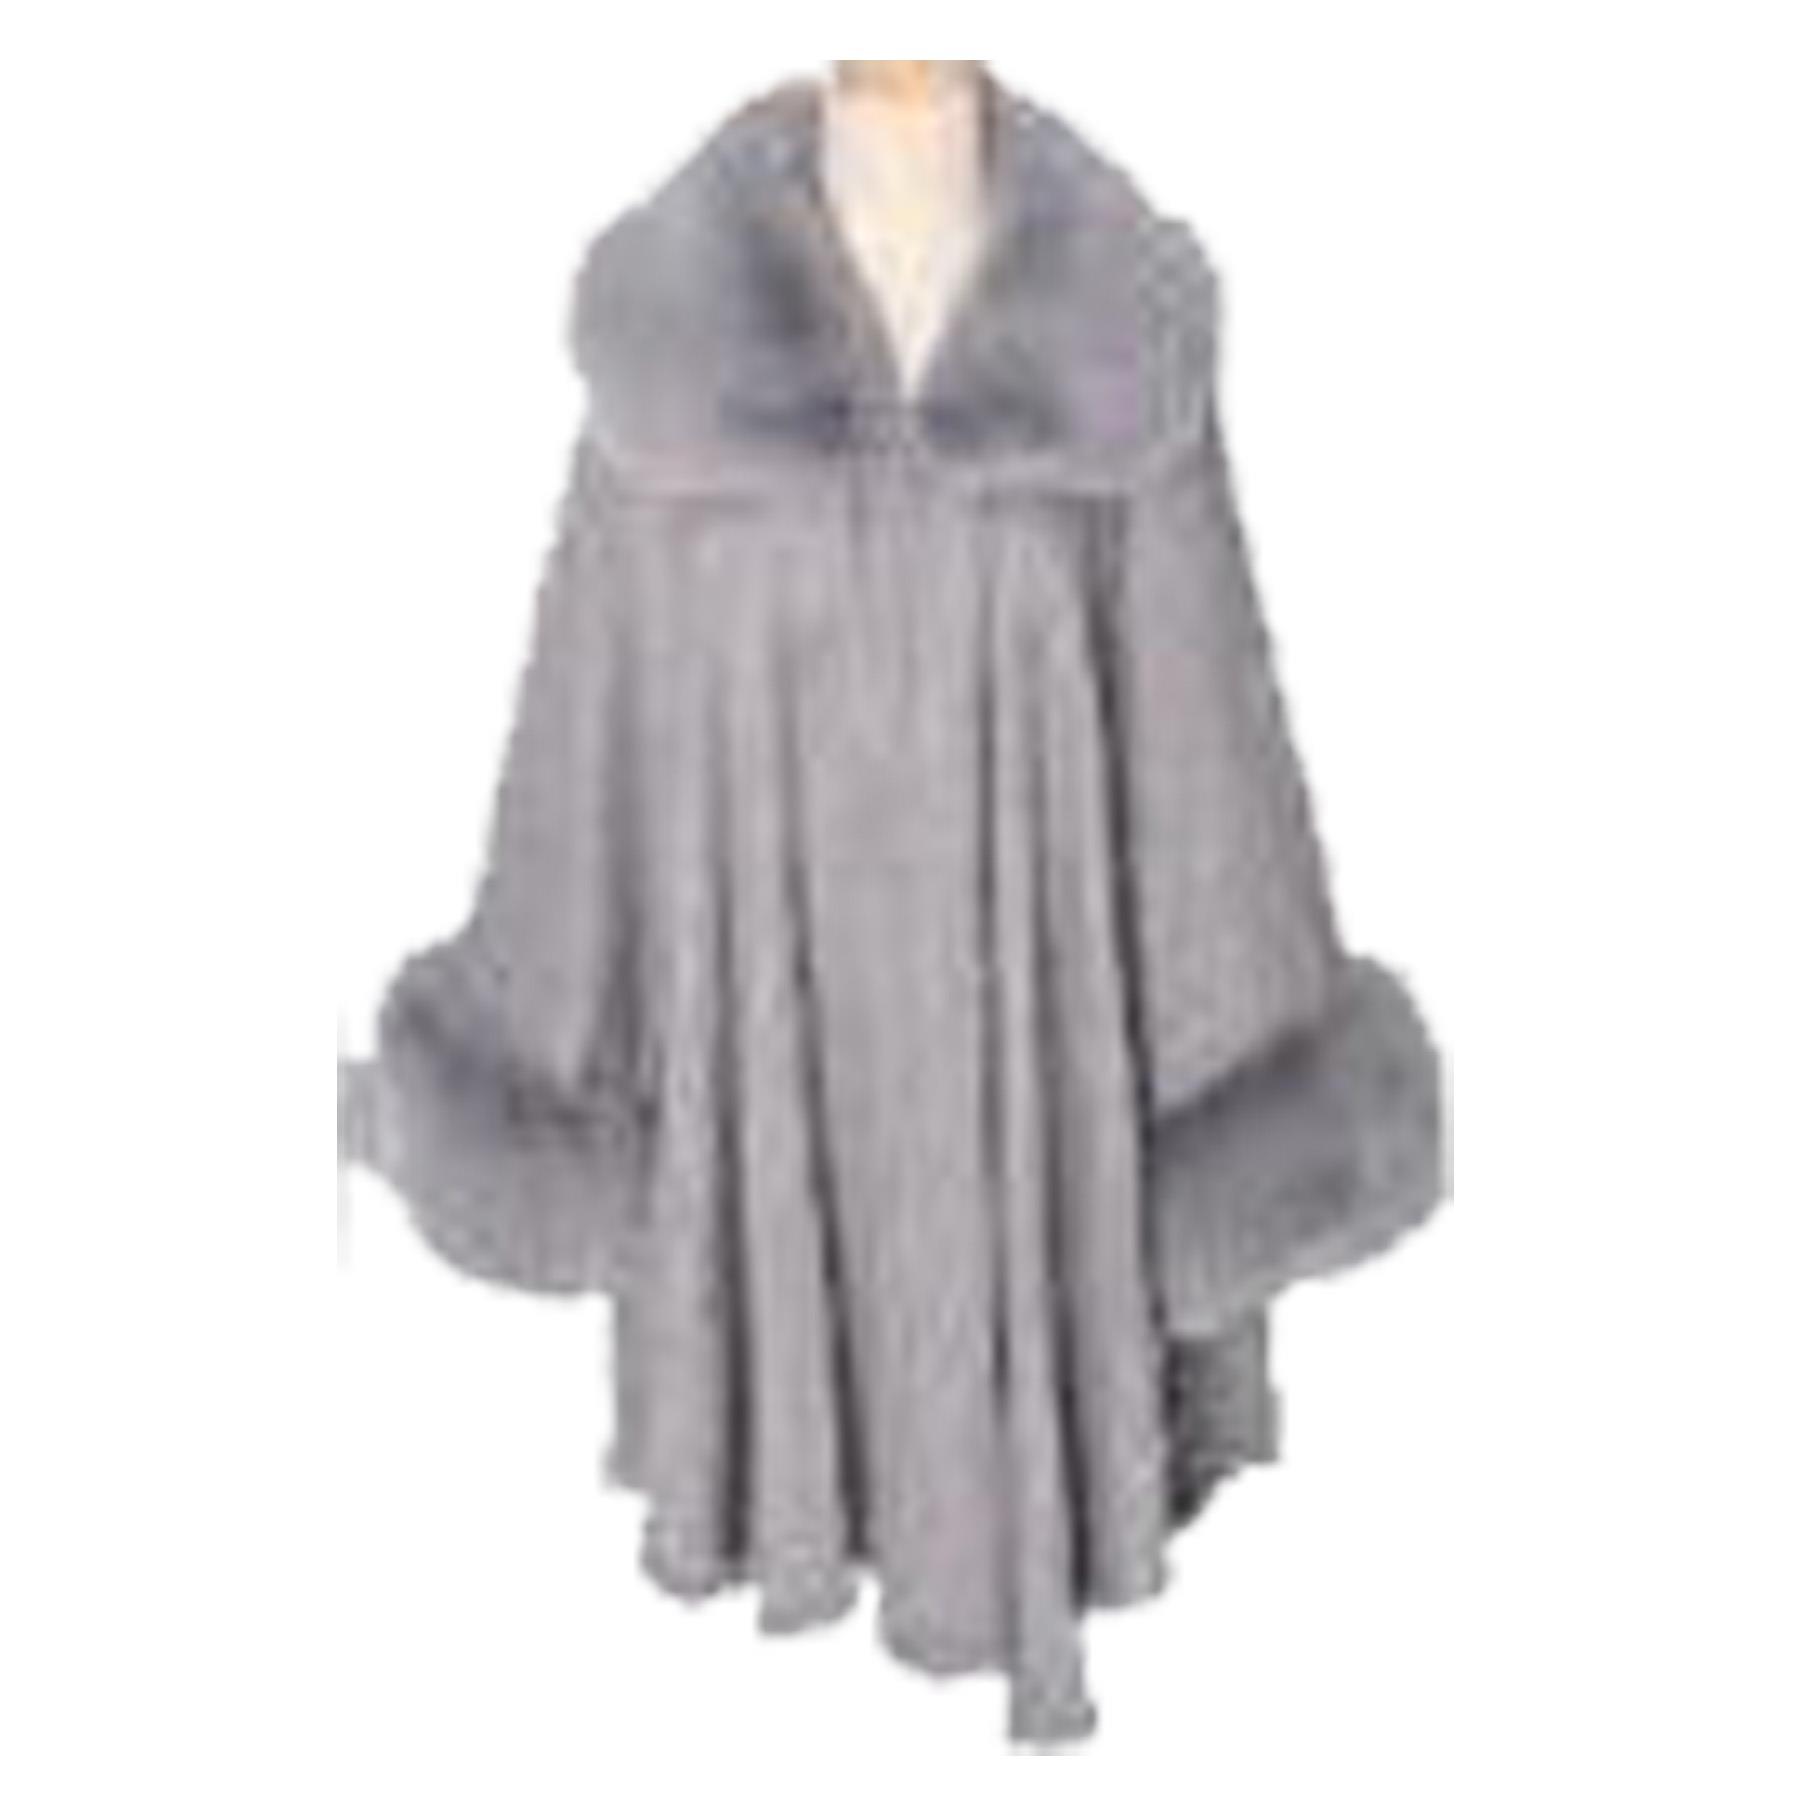 New-Ladies-Faux-Fur-Collar-Cuffs-Long-Sleeve-Winter-Poncho-Cardigan thumbnail 8